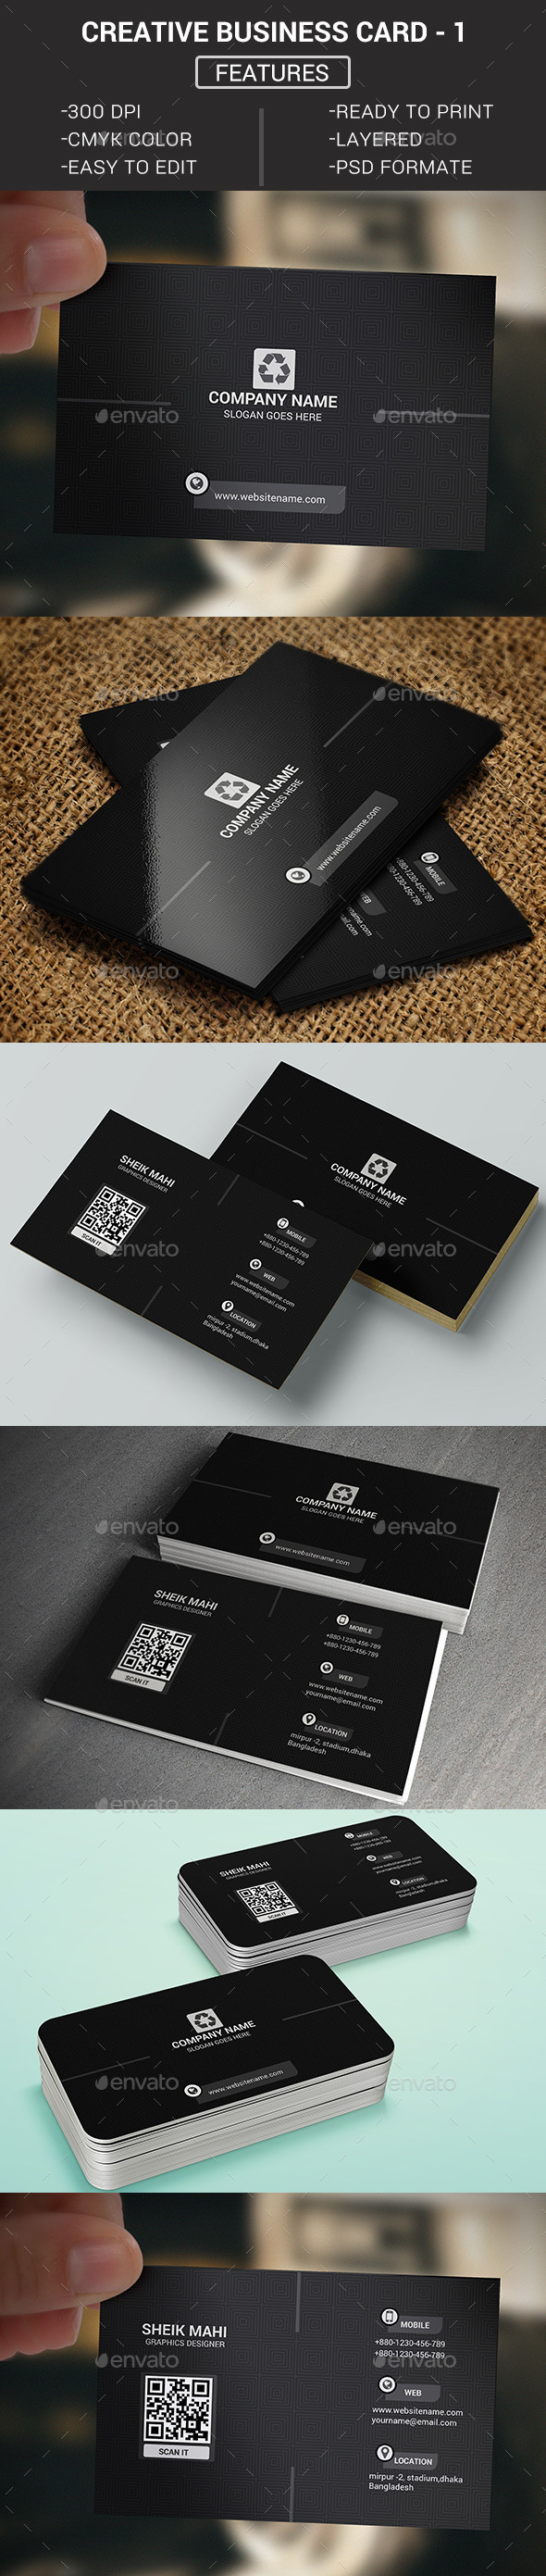 Creative Business Card -1 - Business Cards Print Templates